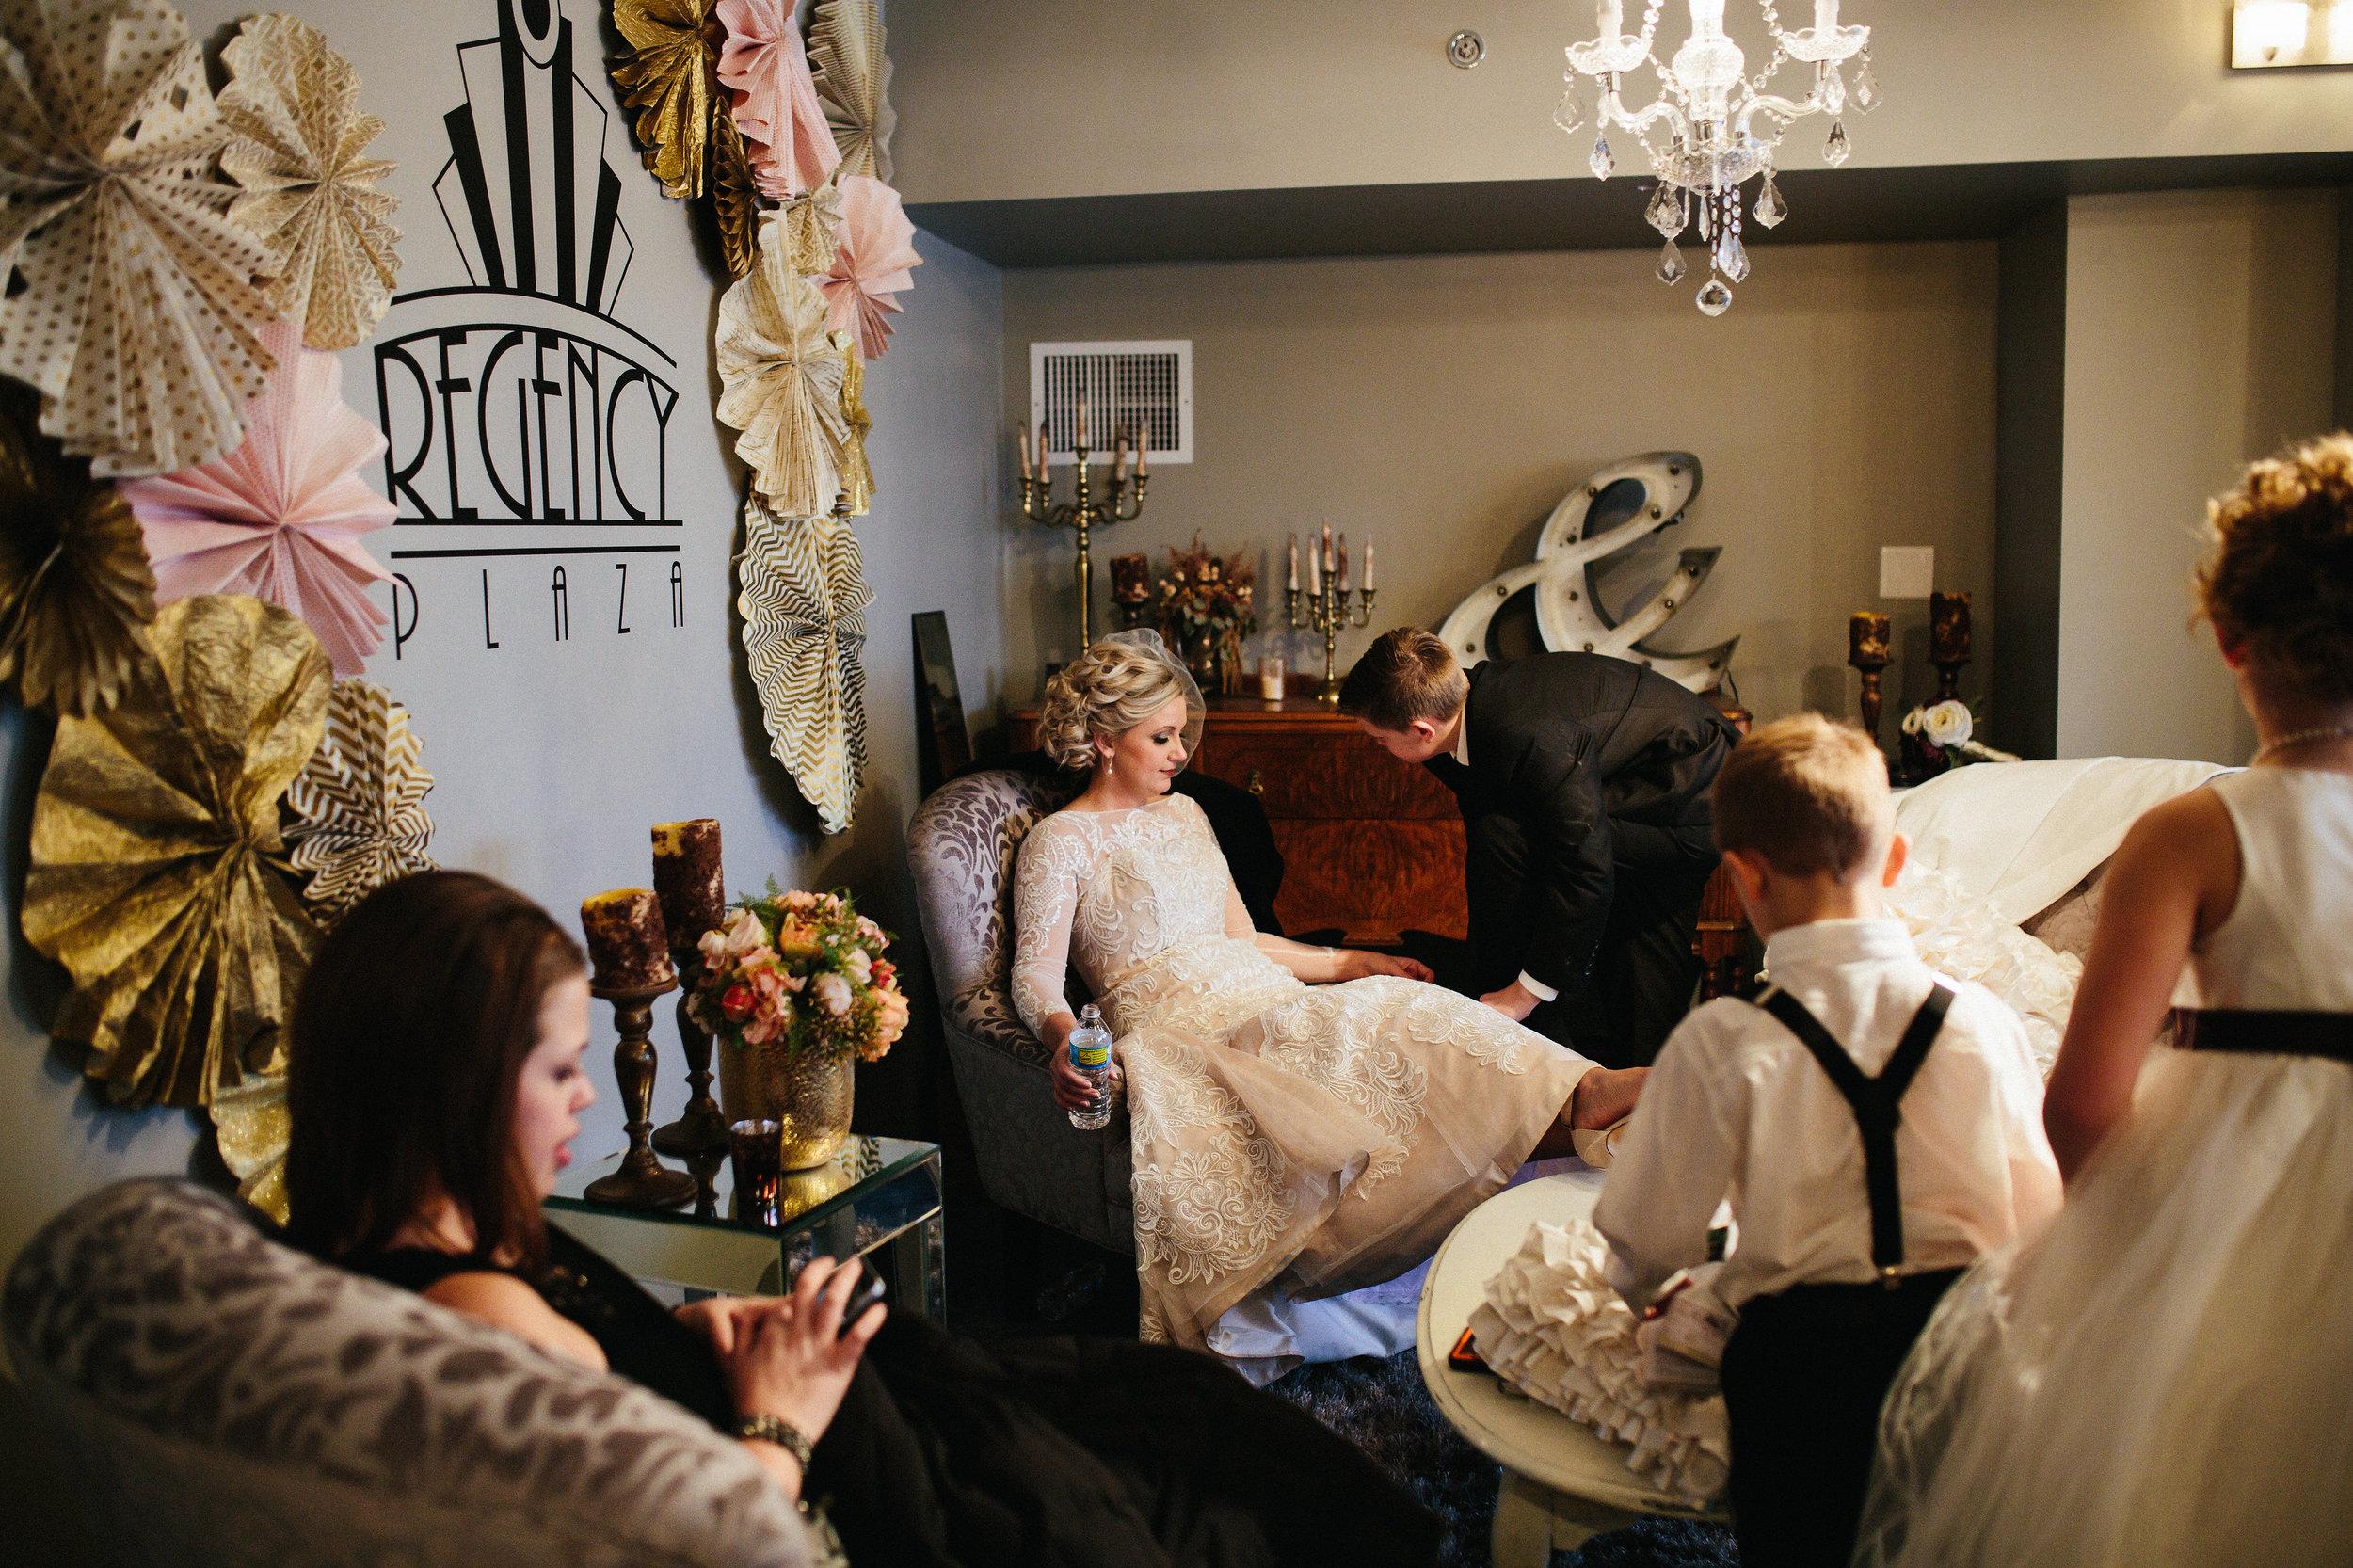 Wedding Suite at 912 Regency Plaza